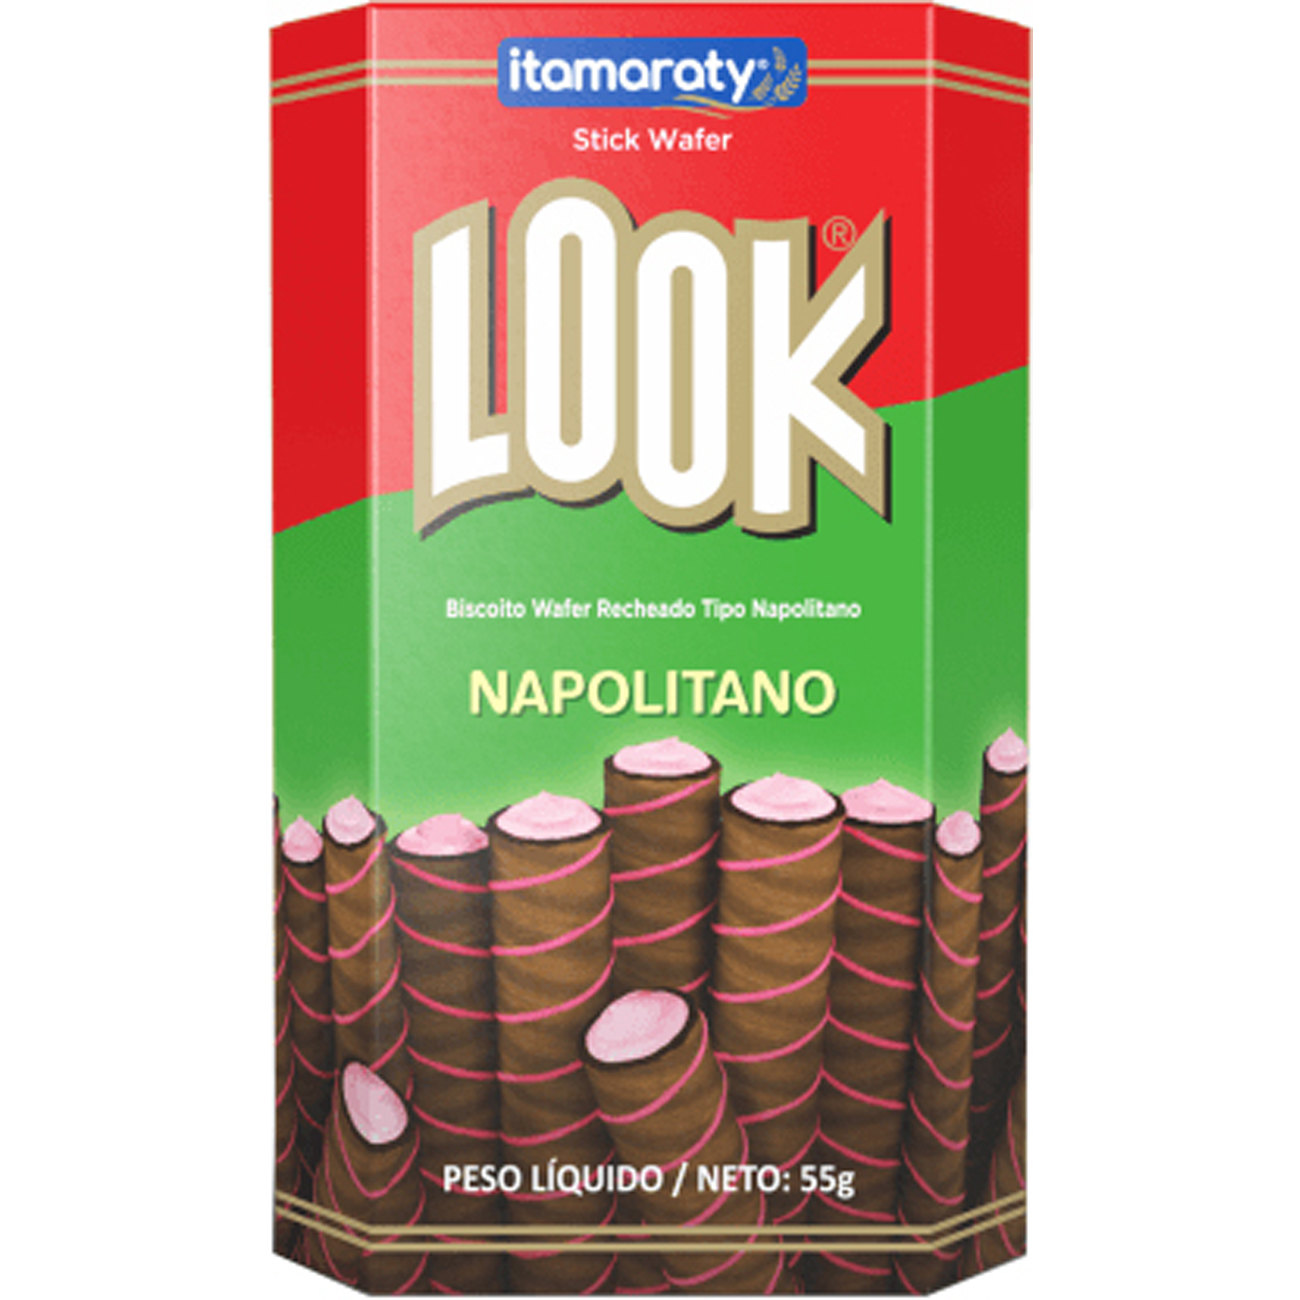 Biscoito Look Stick 55G Waffer Napolitano